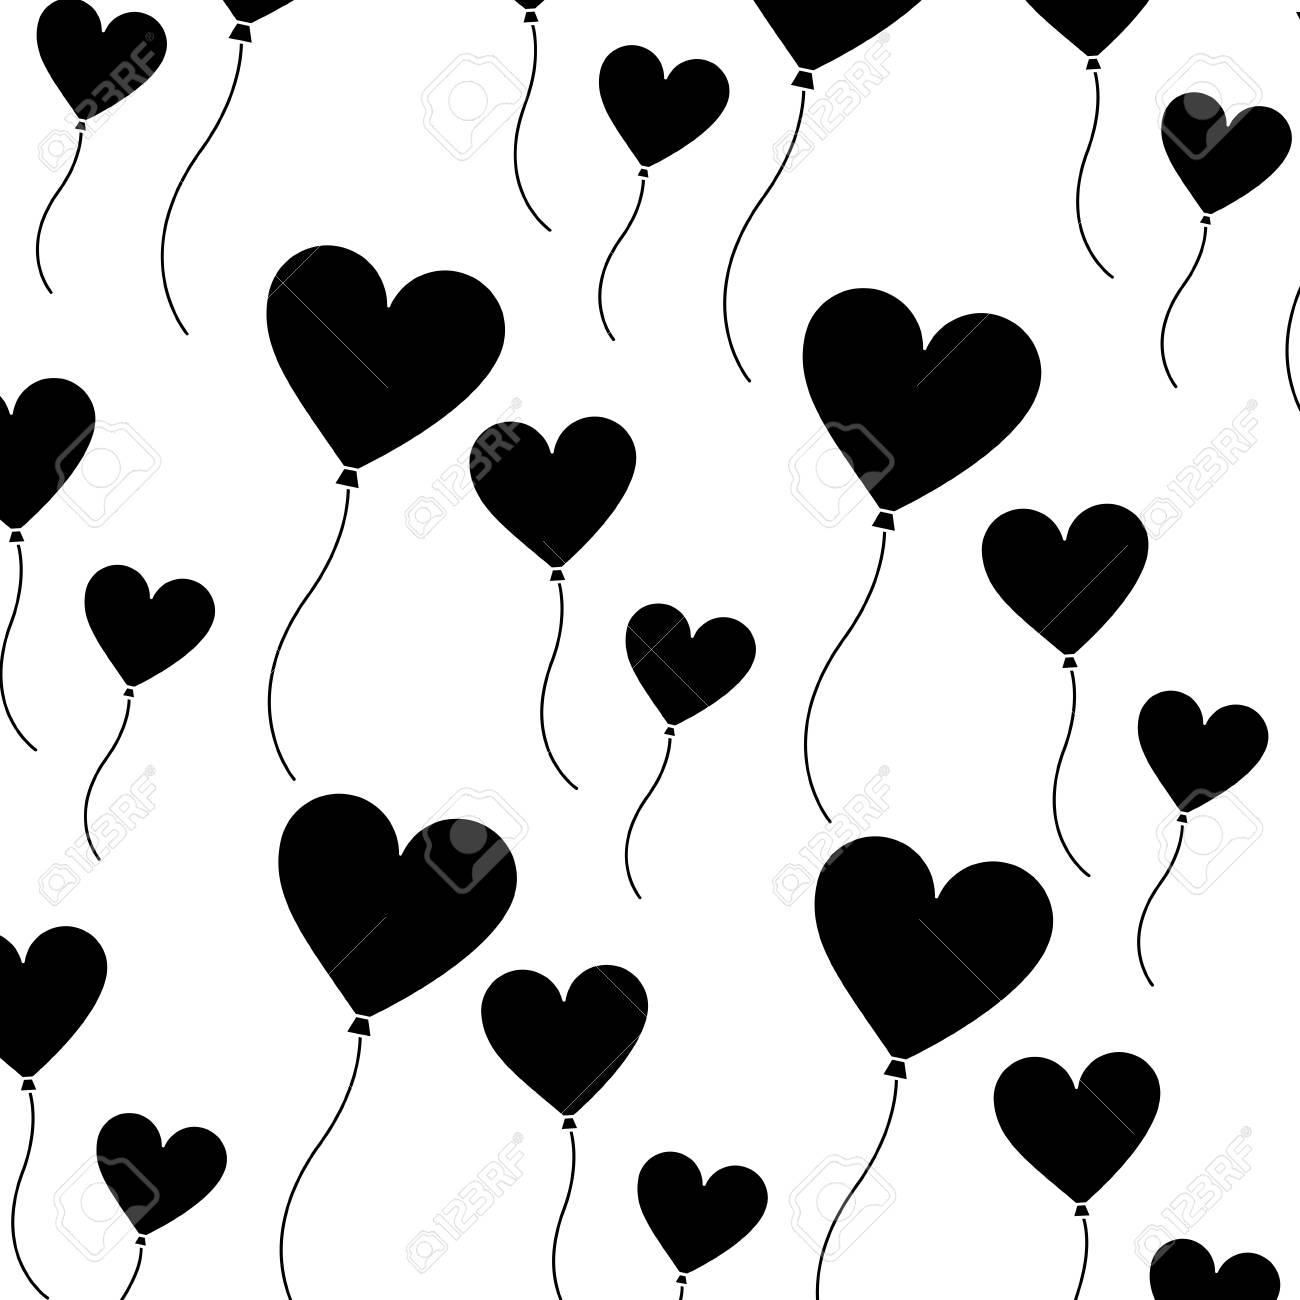 Heart Balloon Valentines Day Icon Image Vector Illustration Design